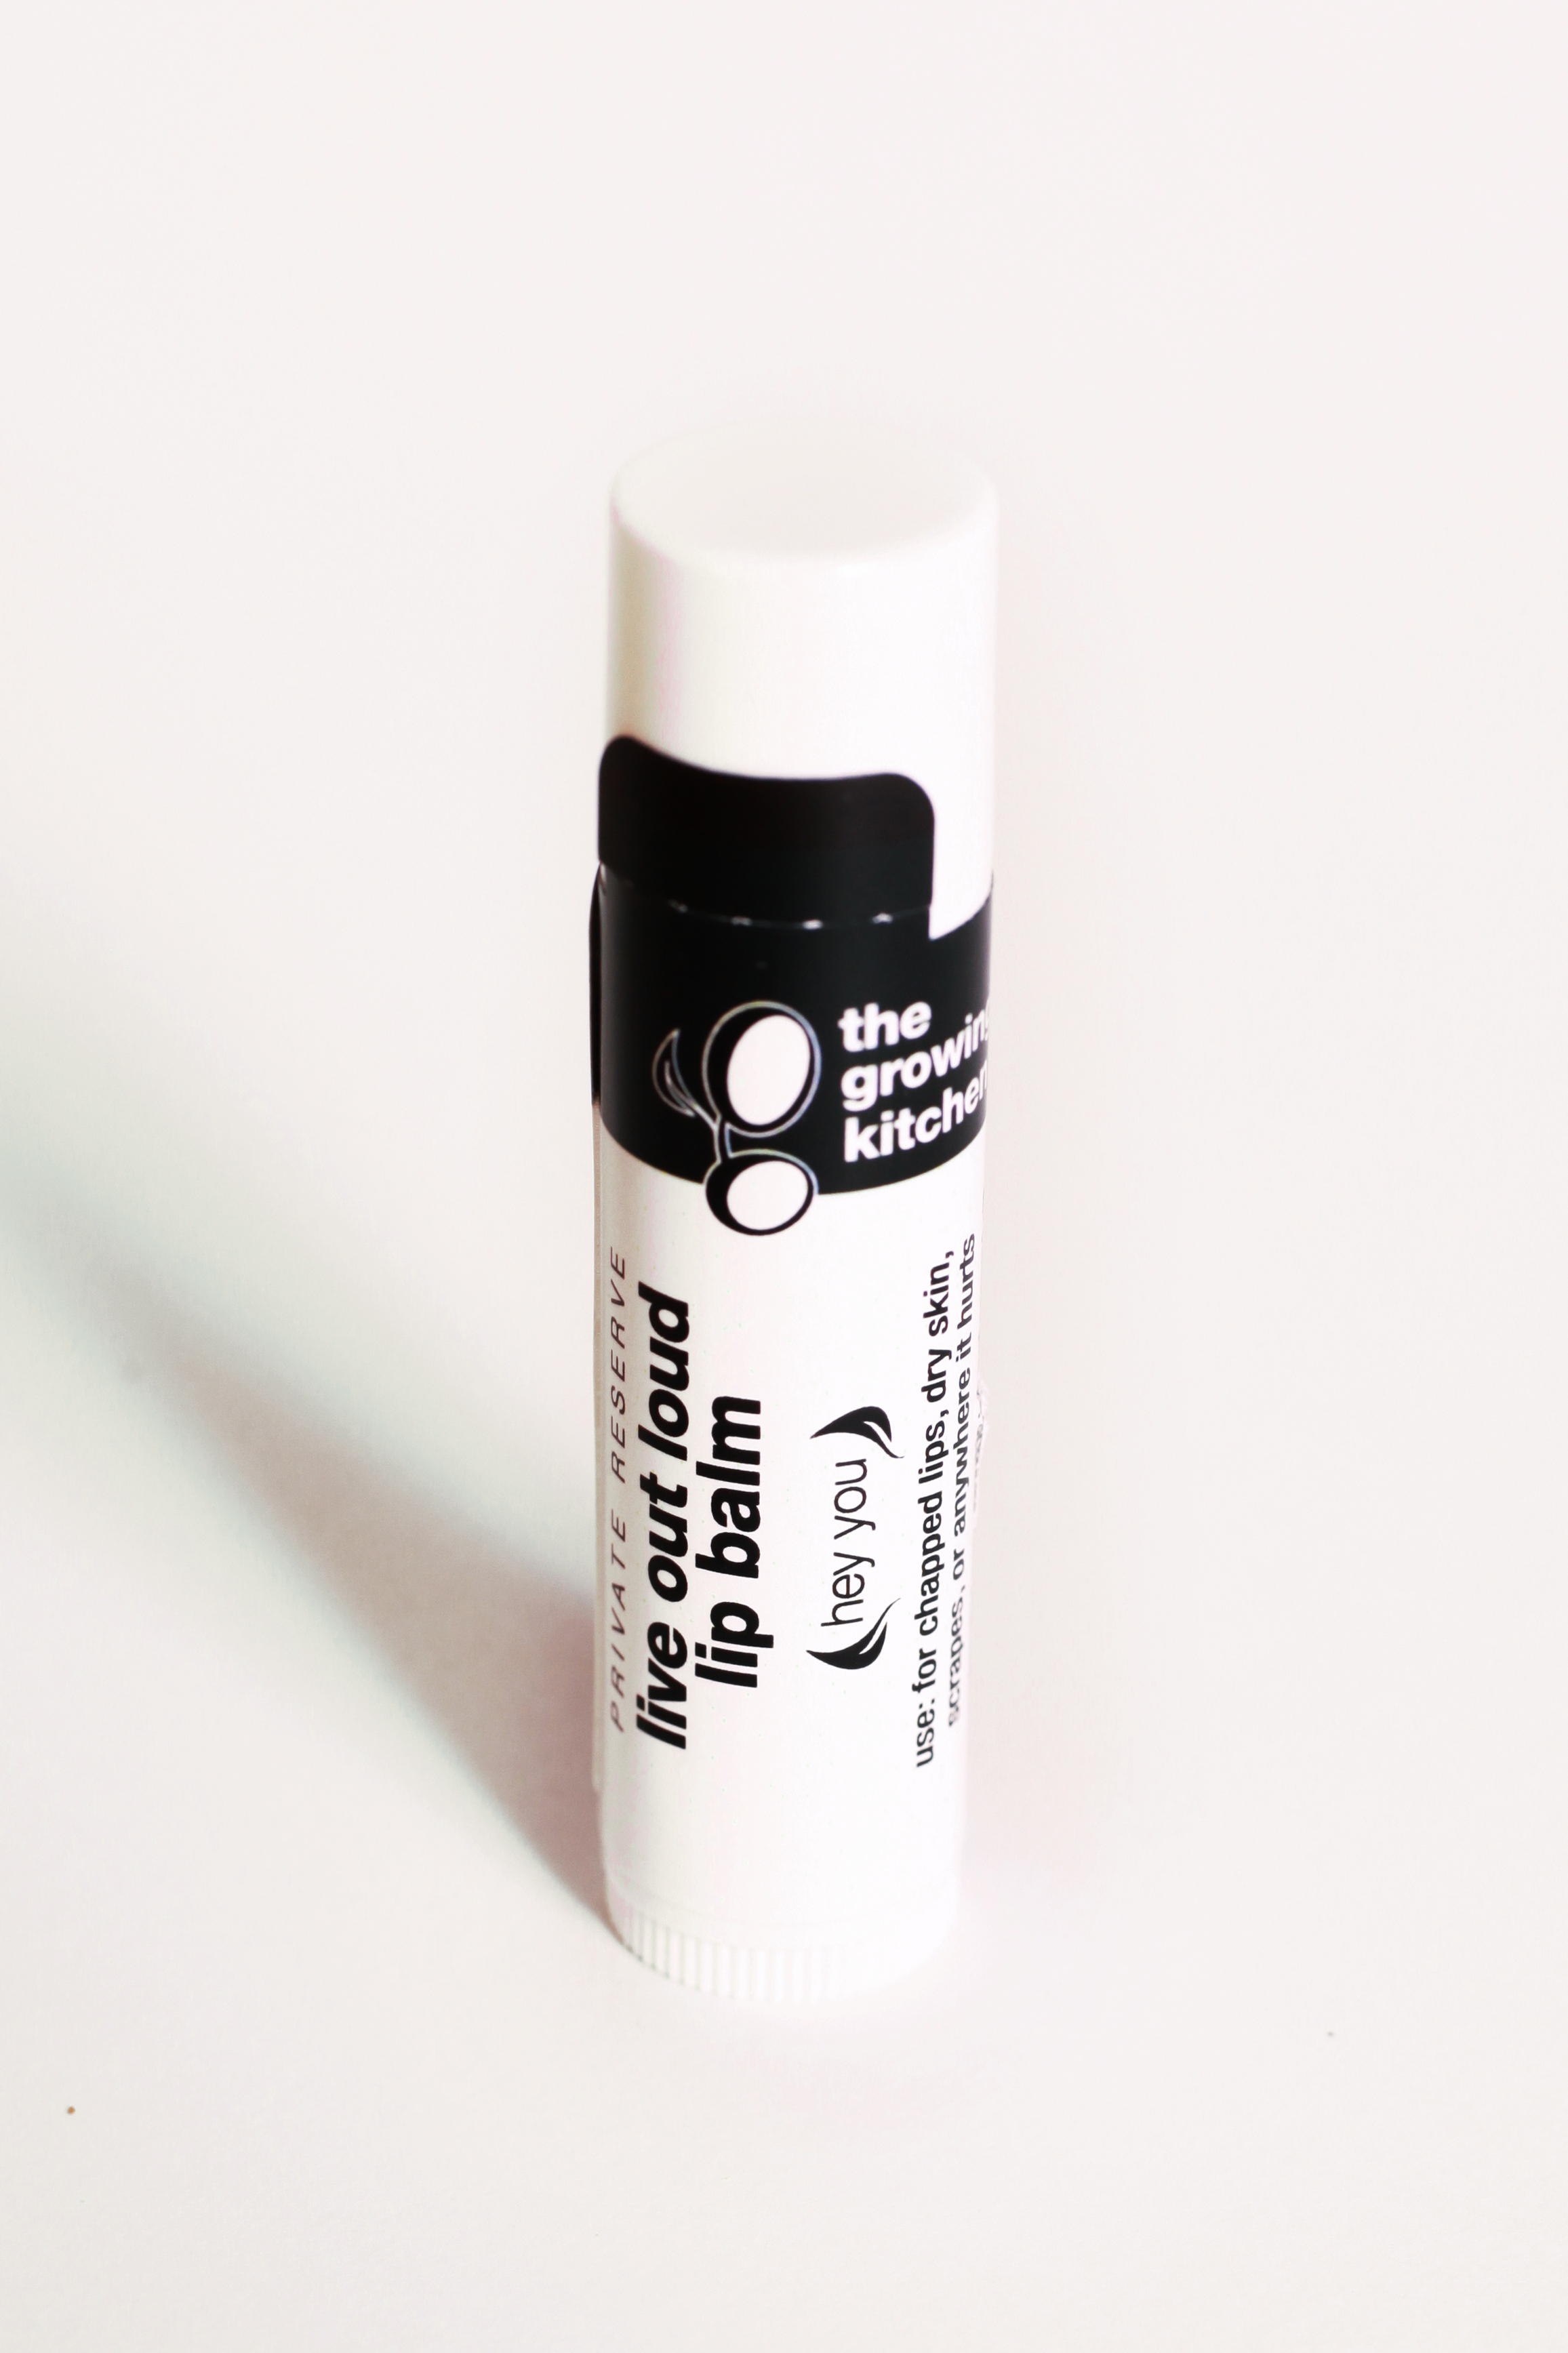 Chapstick1-coloredit-trimmed.jpg